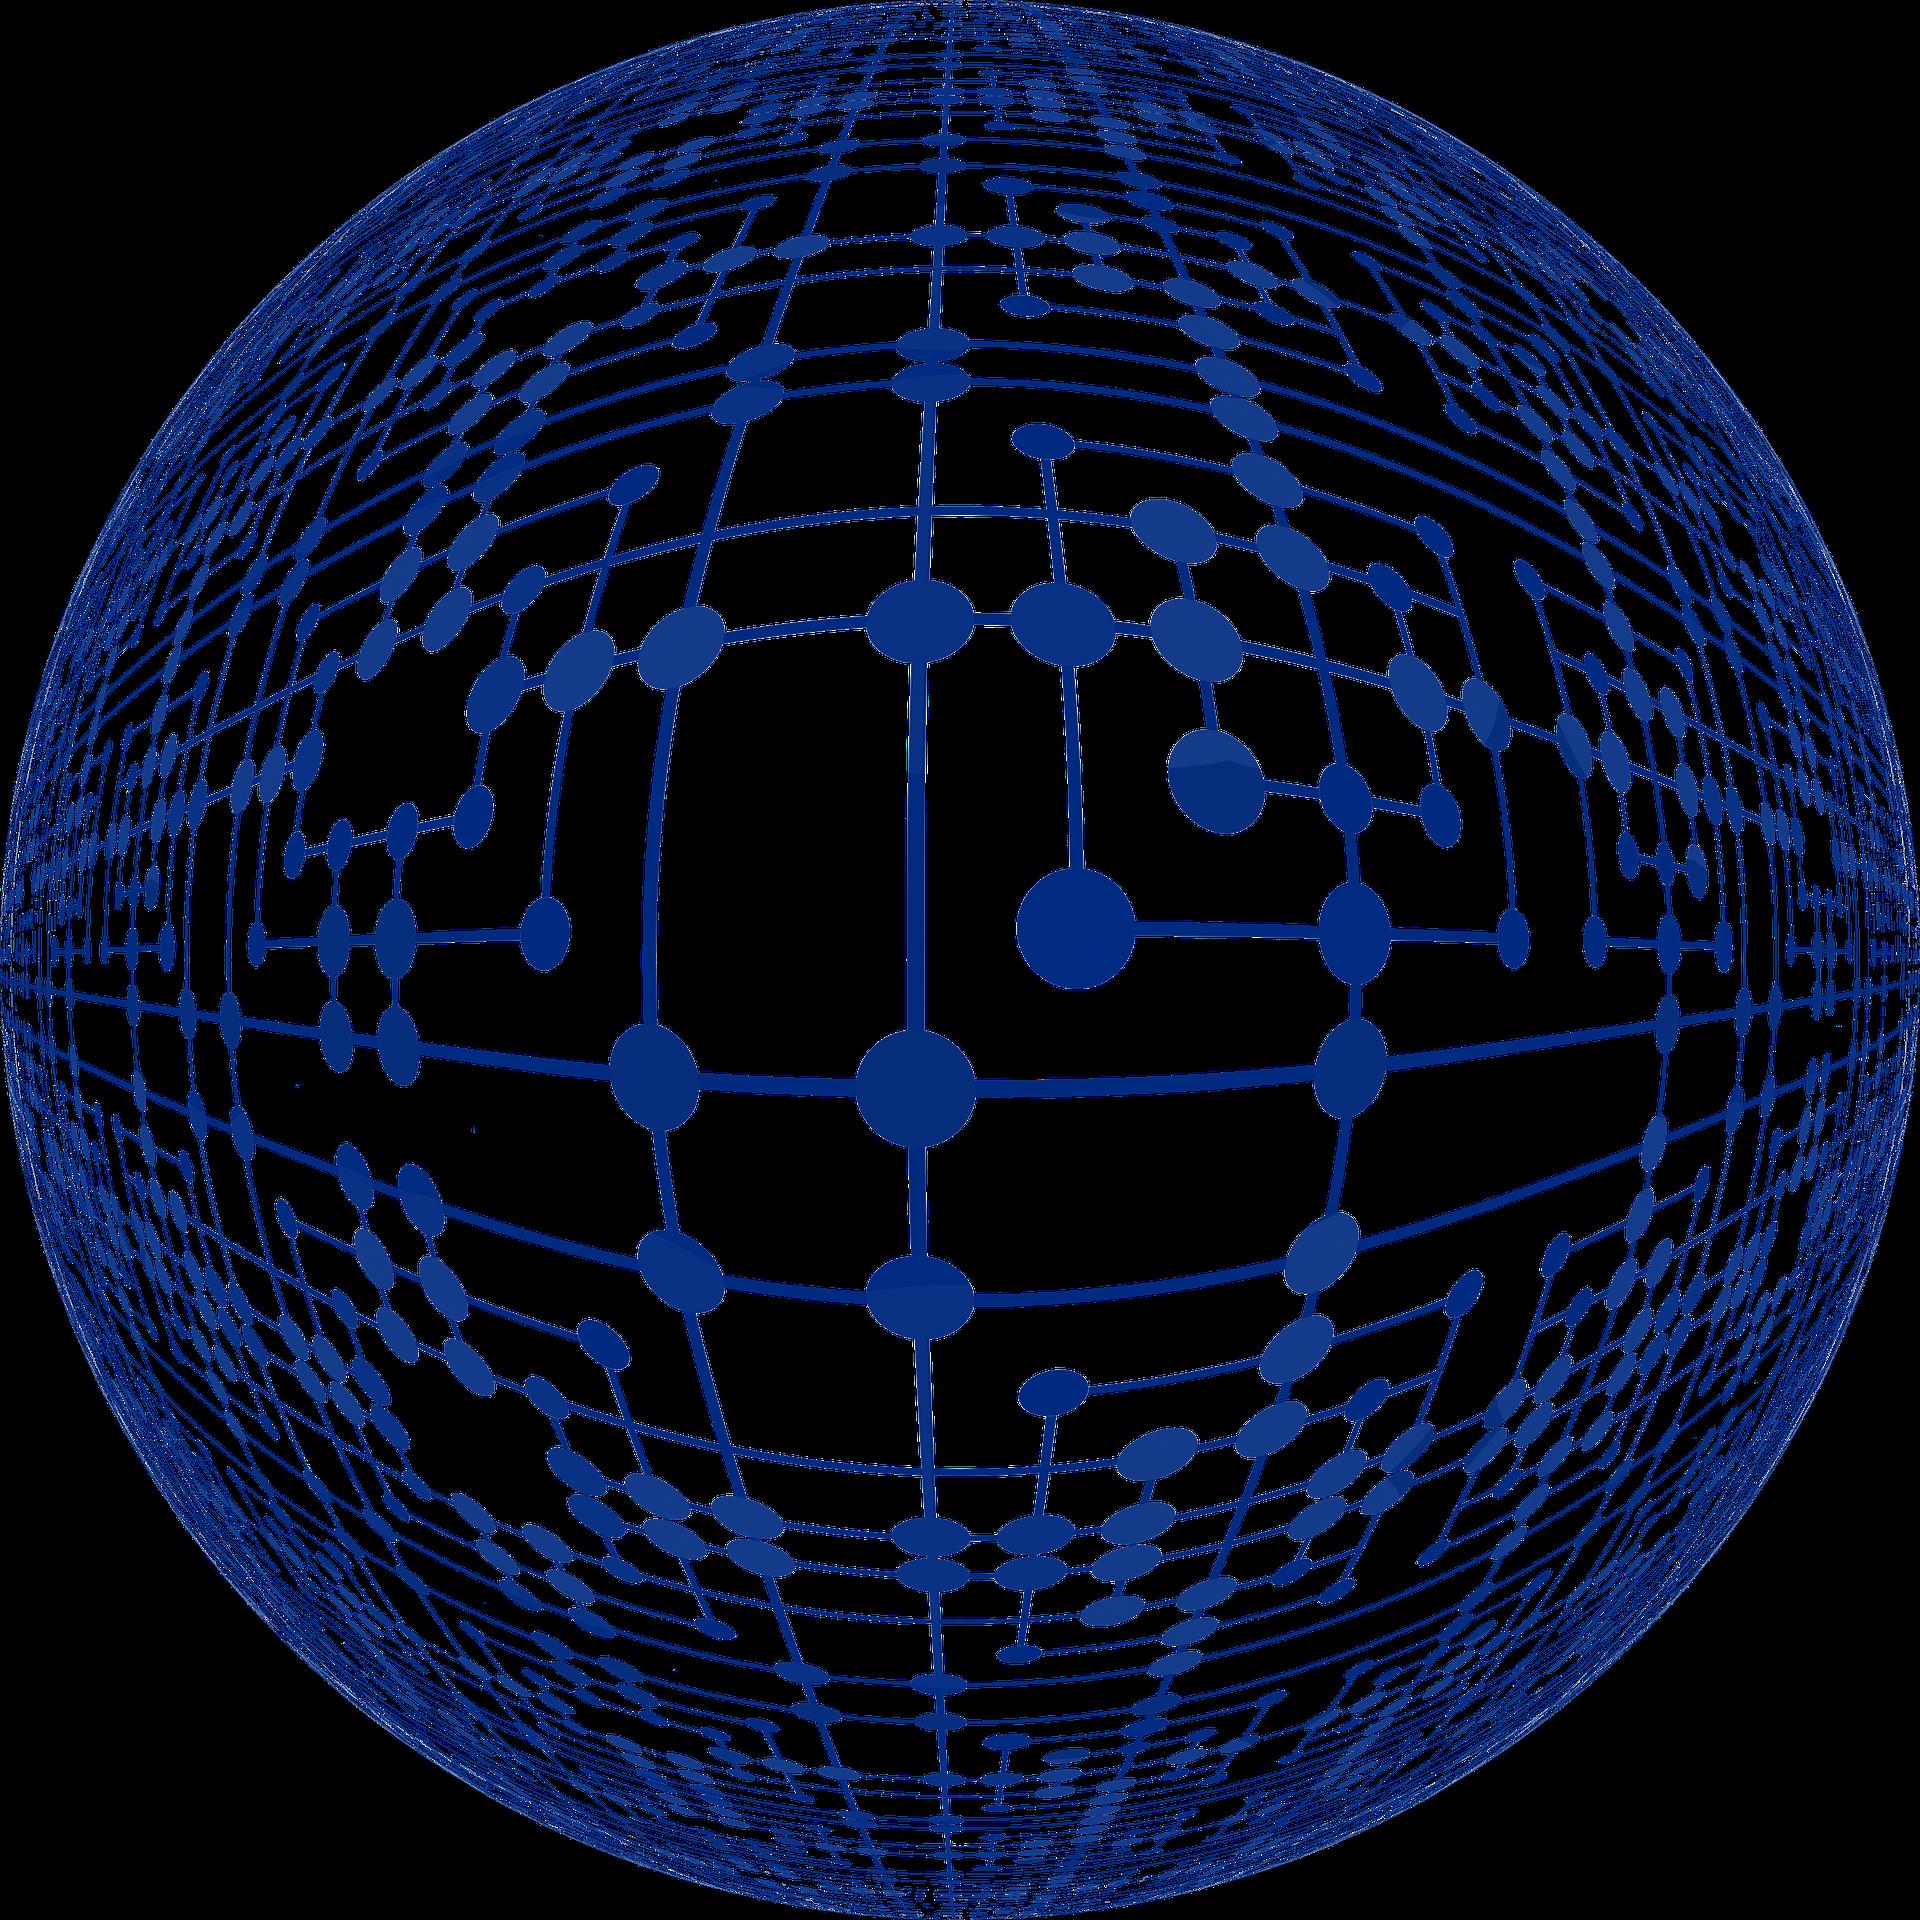 (Image Credit: Geralt; Pixabay; Public Domain